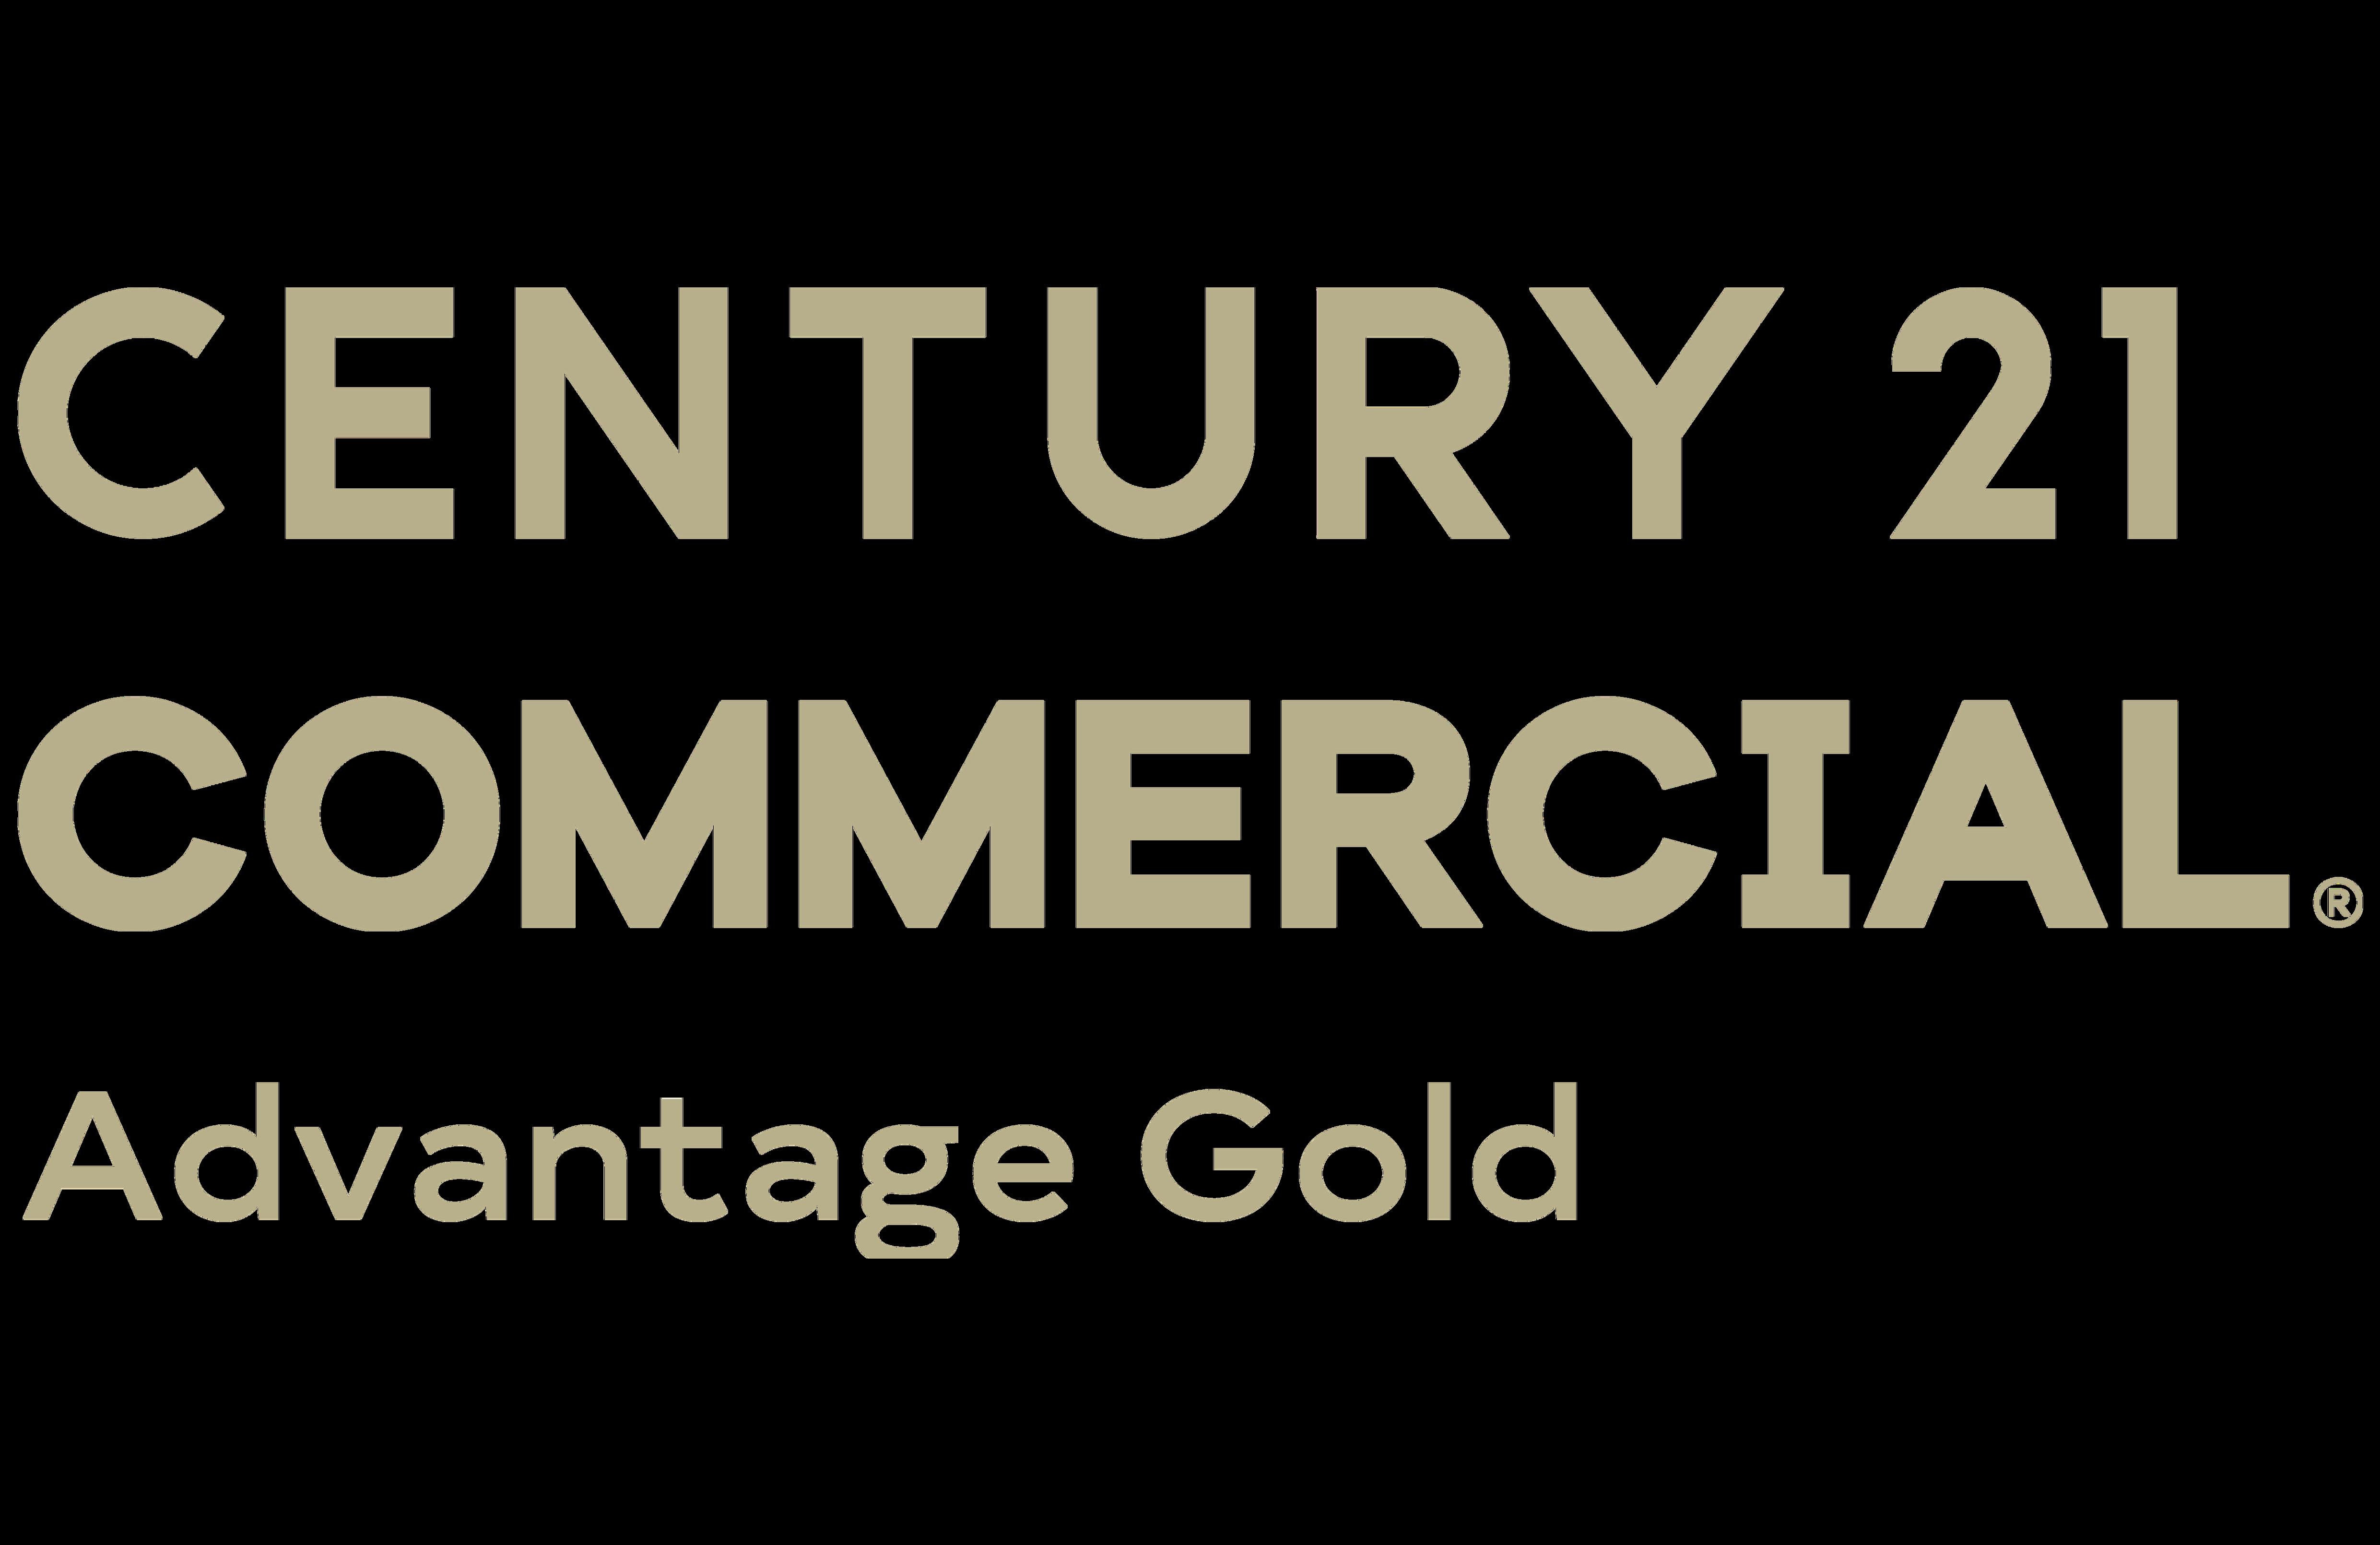 David F Joslin Jr of CENTURY 21 Advantage Gold logo